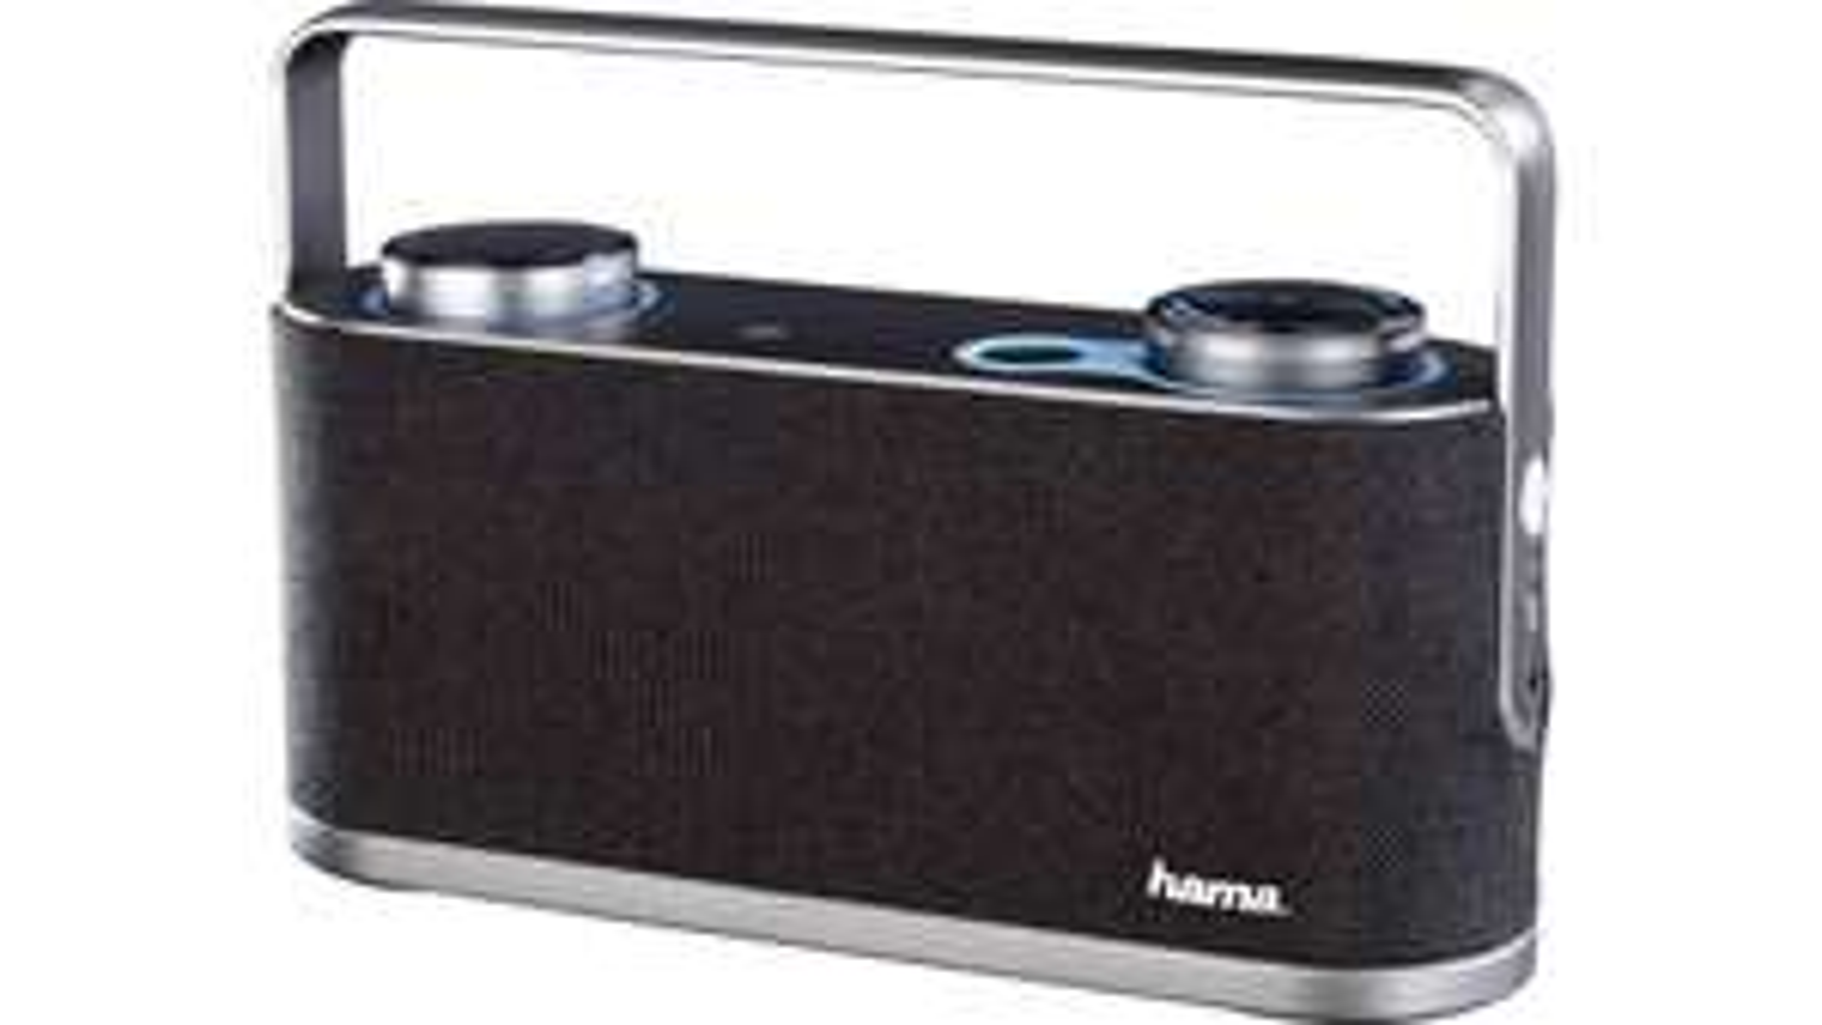 Hama Soundchest Bluetooth Lautsprecher bei voelkner.de